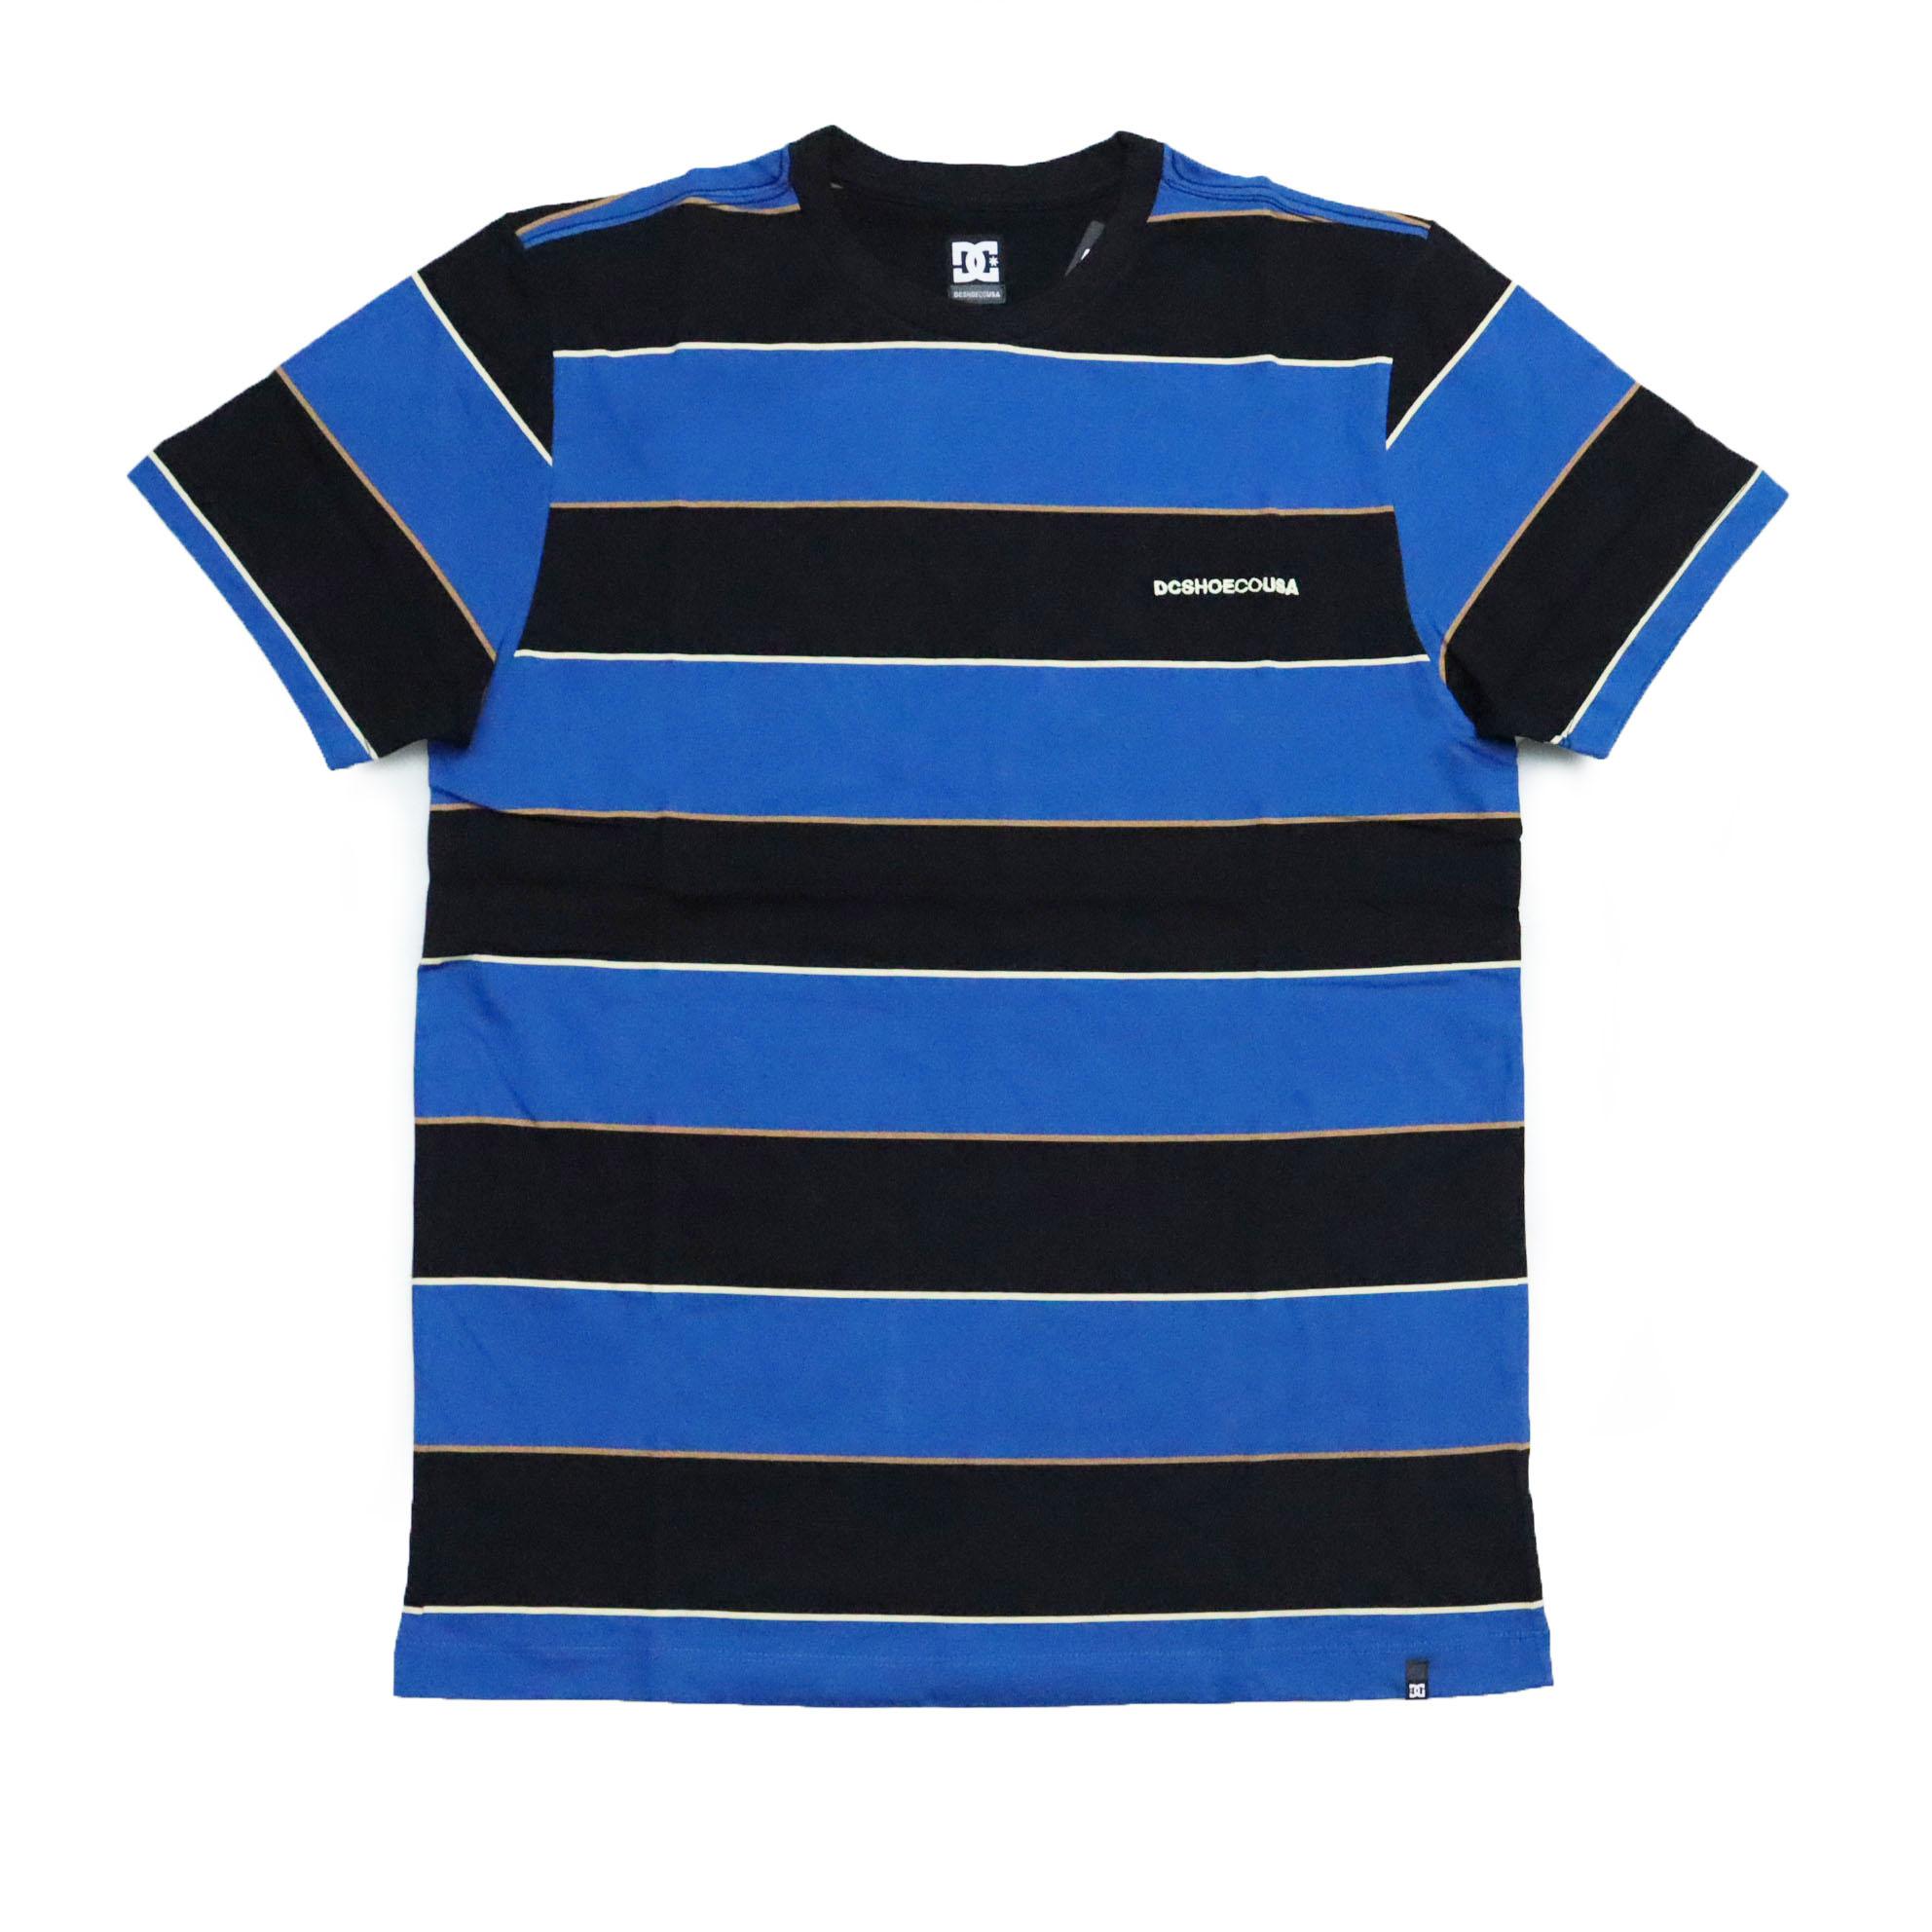 Camiseta DC Shoes Rally Stripe - Azul/Preto